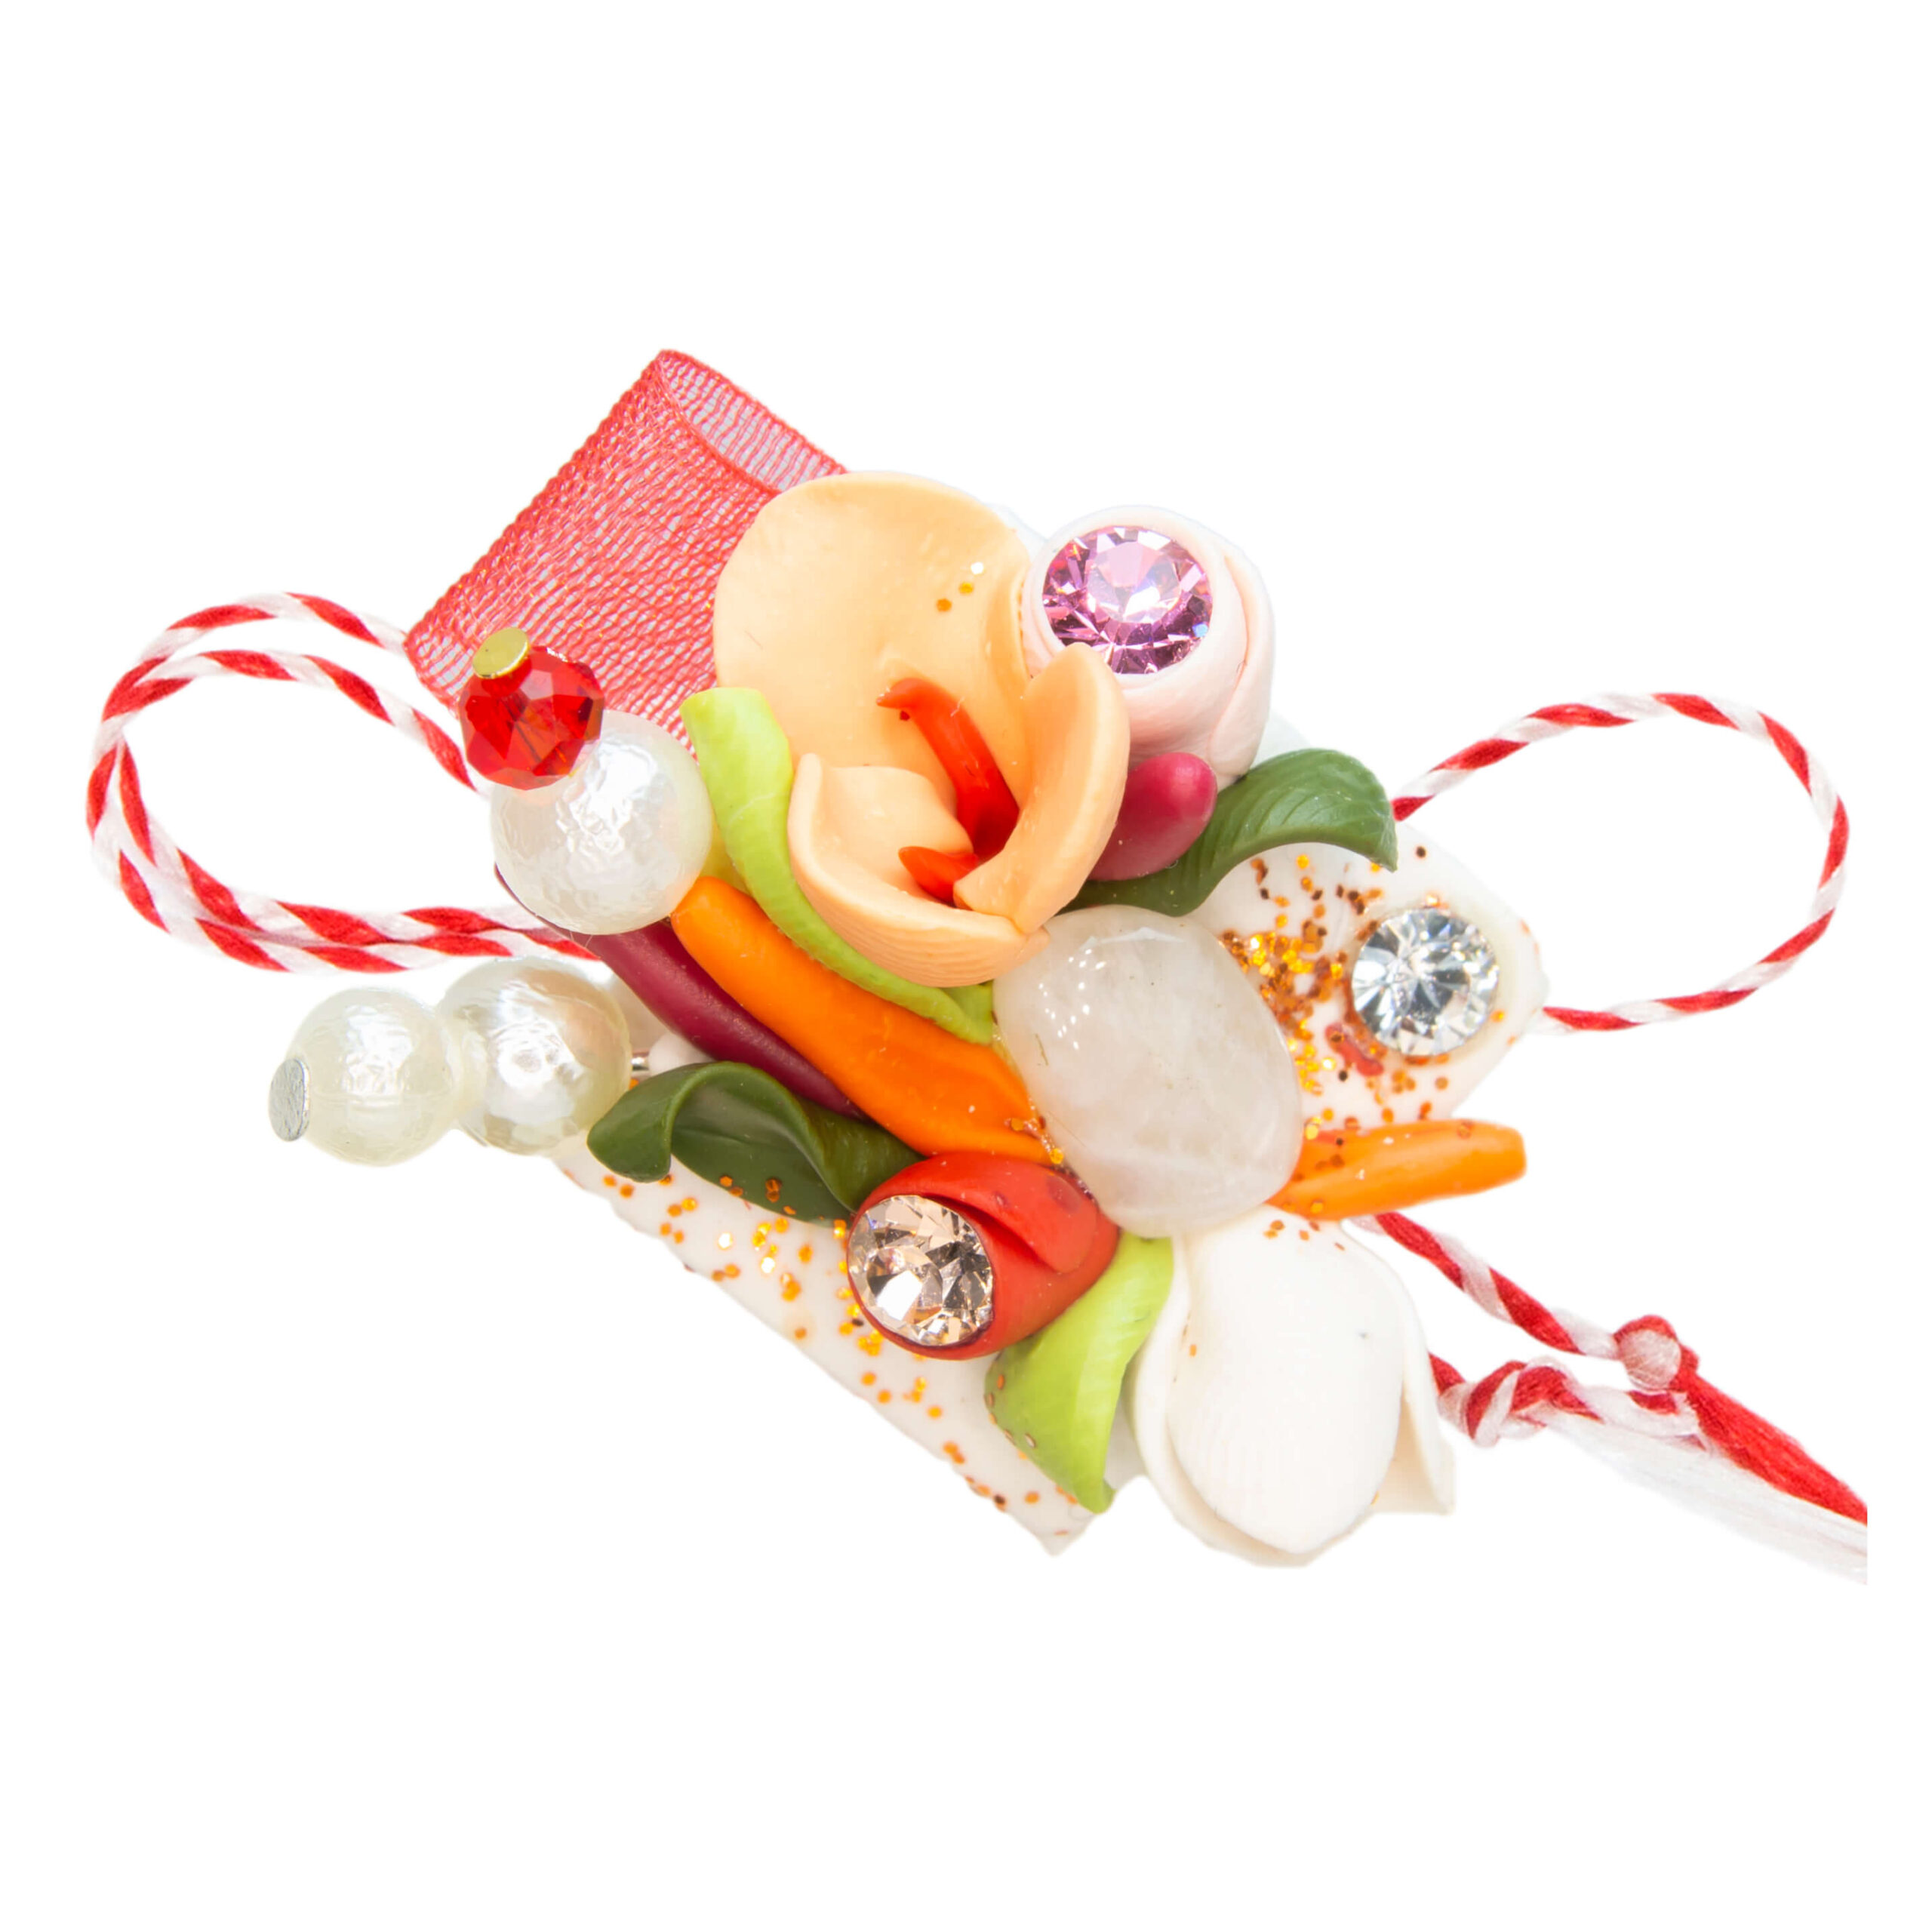 Martisor brosa buchet flori, Miidefloriart, model 47